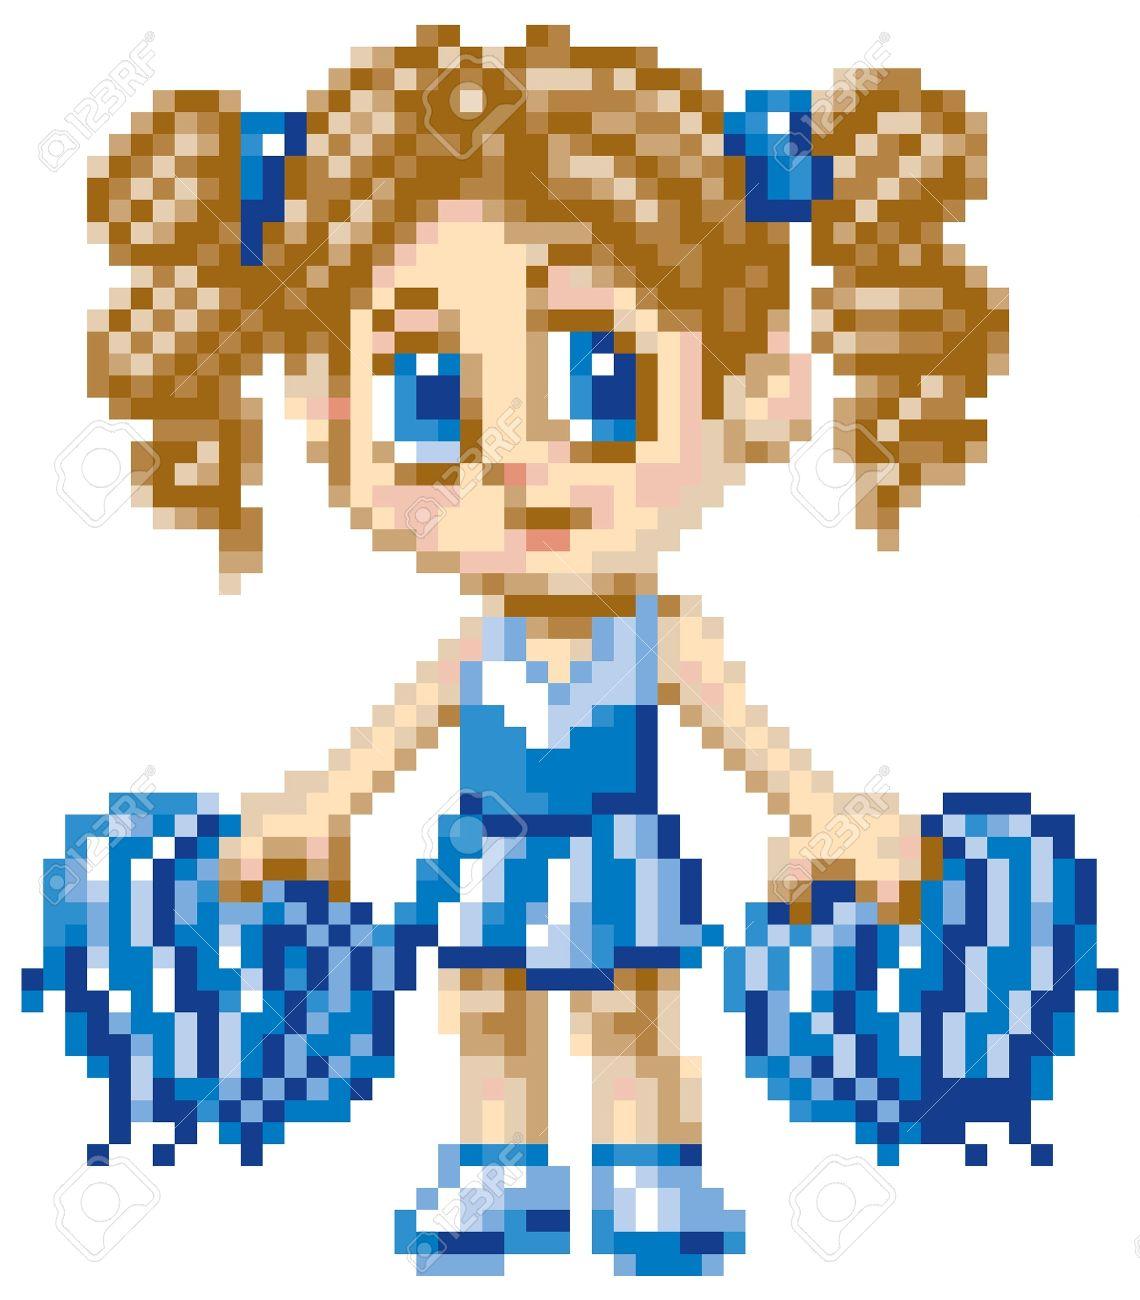 Pixel Art Personnage Manga Facile